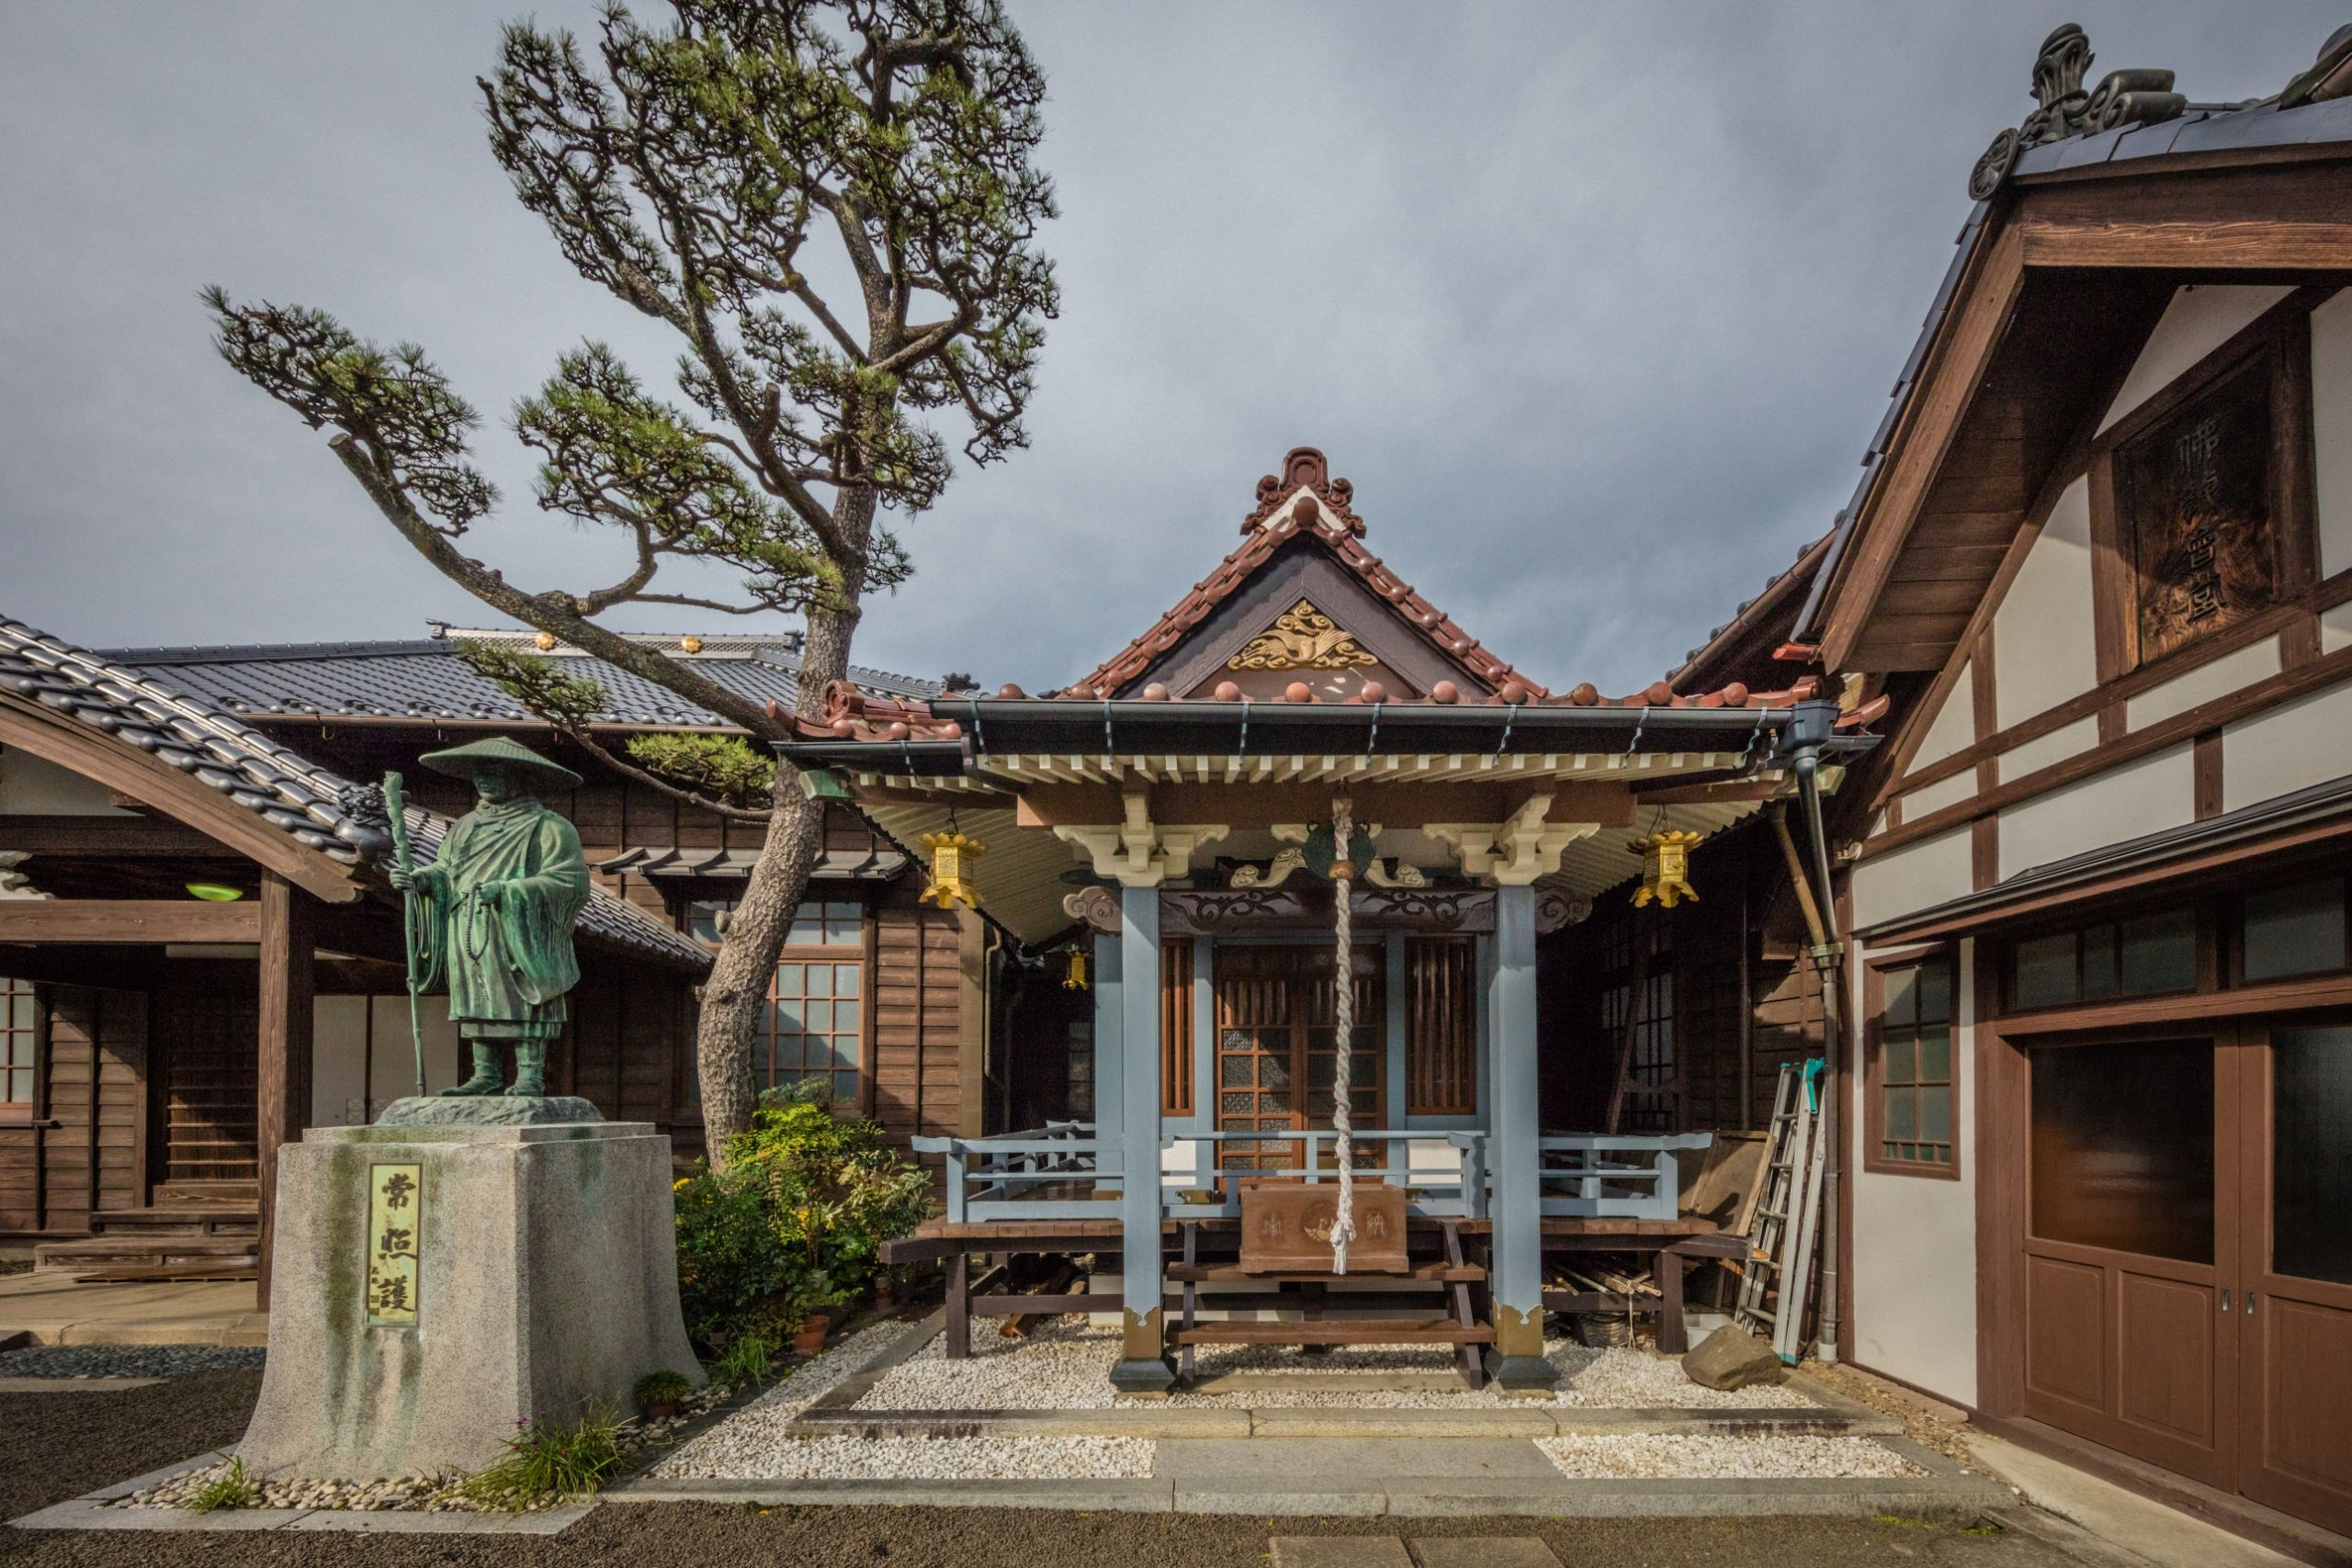 Sennenji Temple